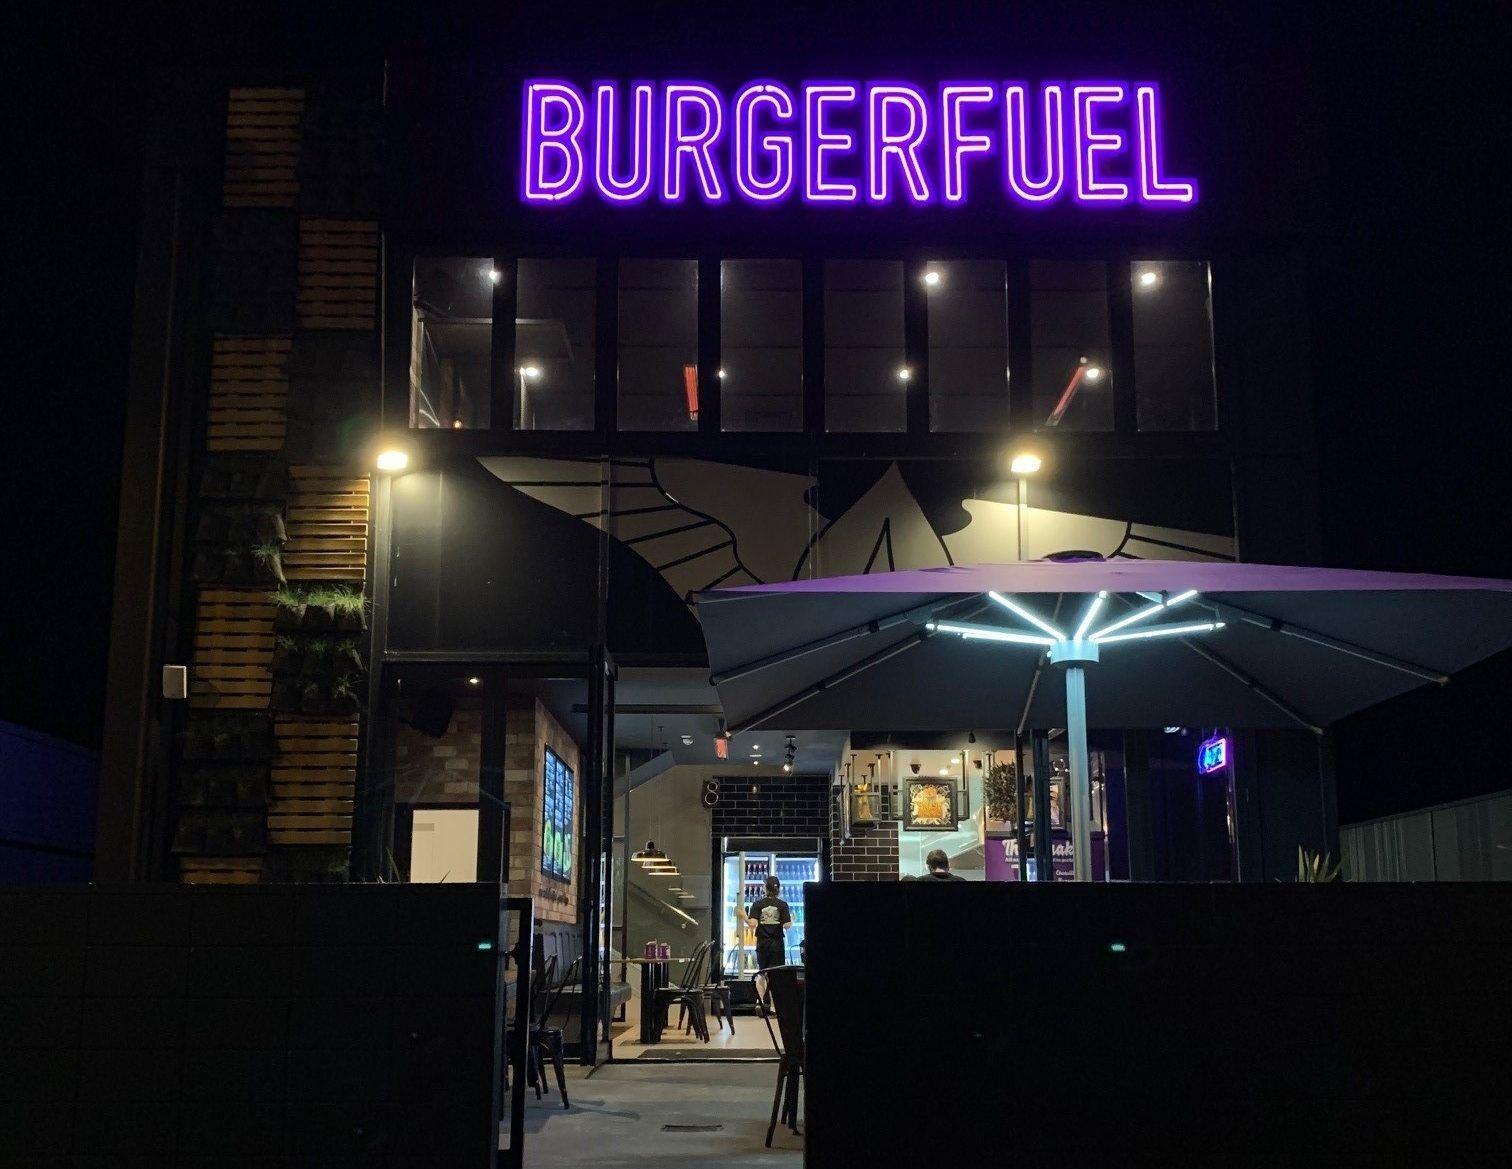 BurgerFuel Tempest LED